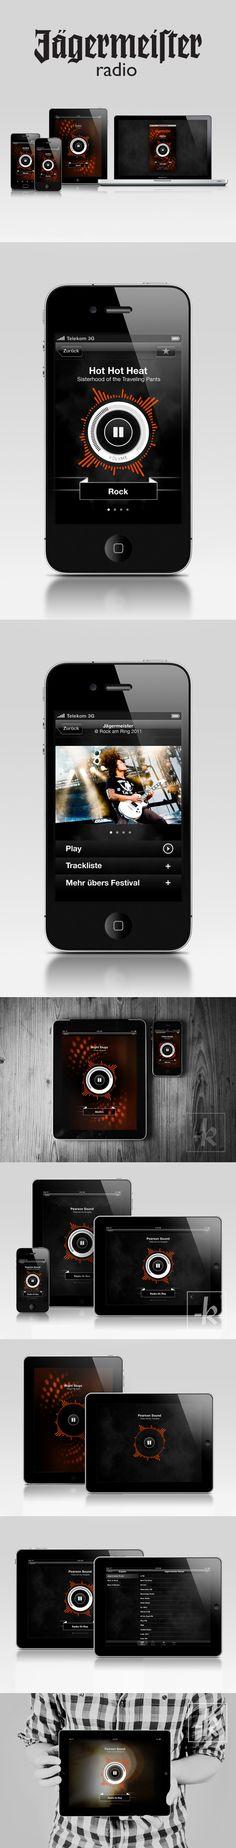 Jägermeister - Radio Apps by Krunchtime , via Behance   ***   Jägermeister Radio Player Apps for mobile (iPhone, iPad, Android), desktop (Mac/Win), and www (Mainsite/Facebook).